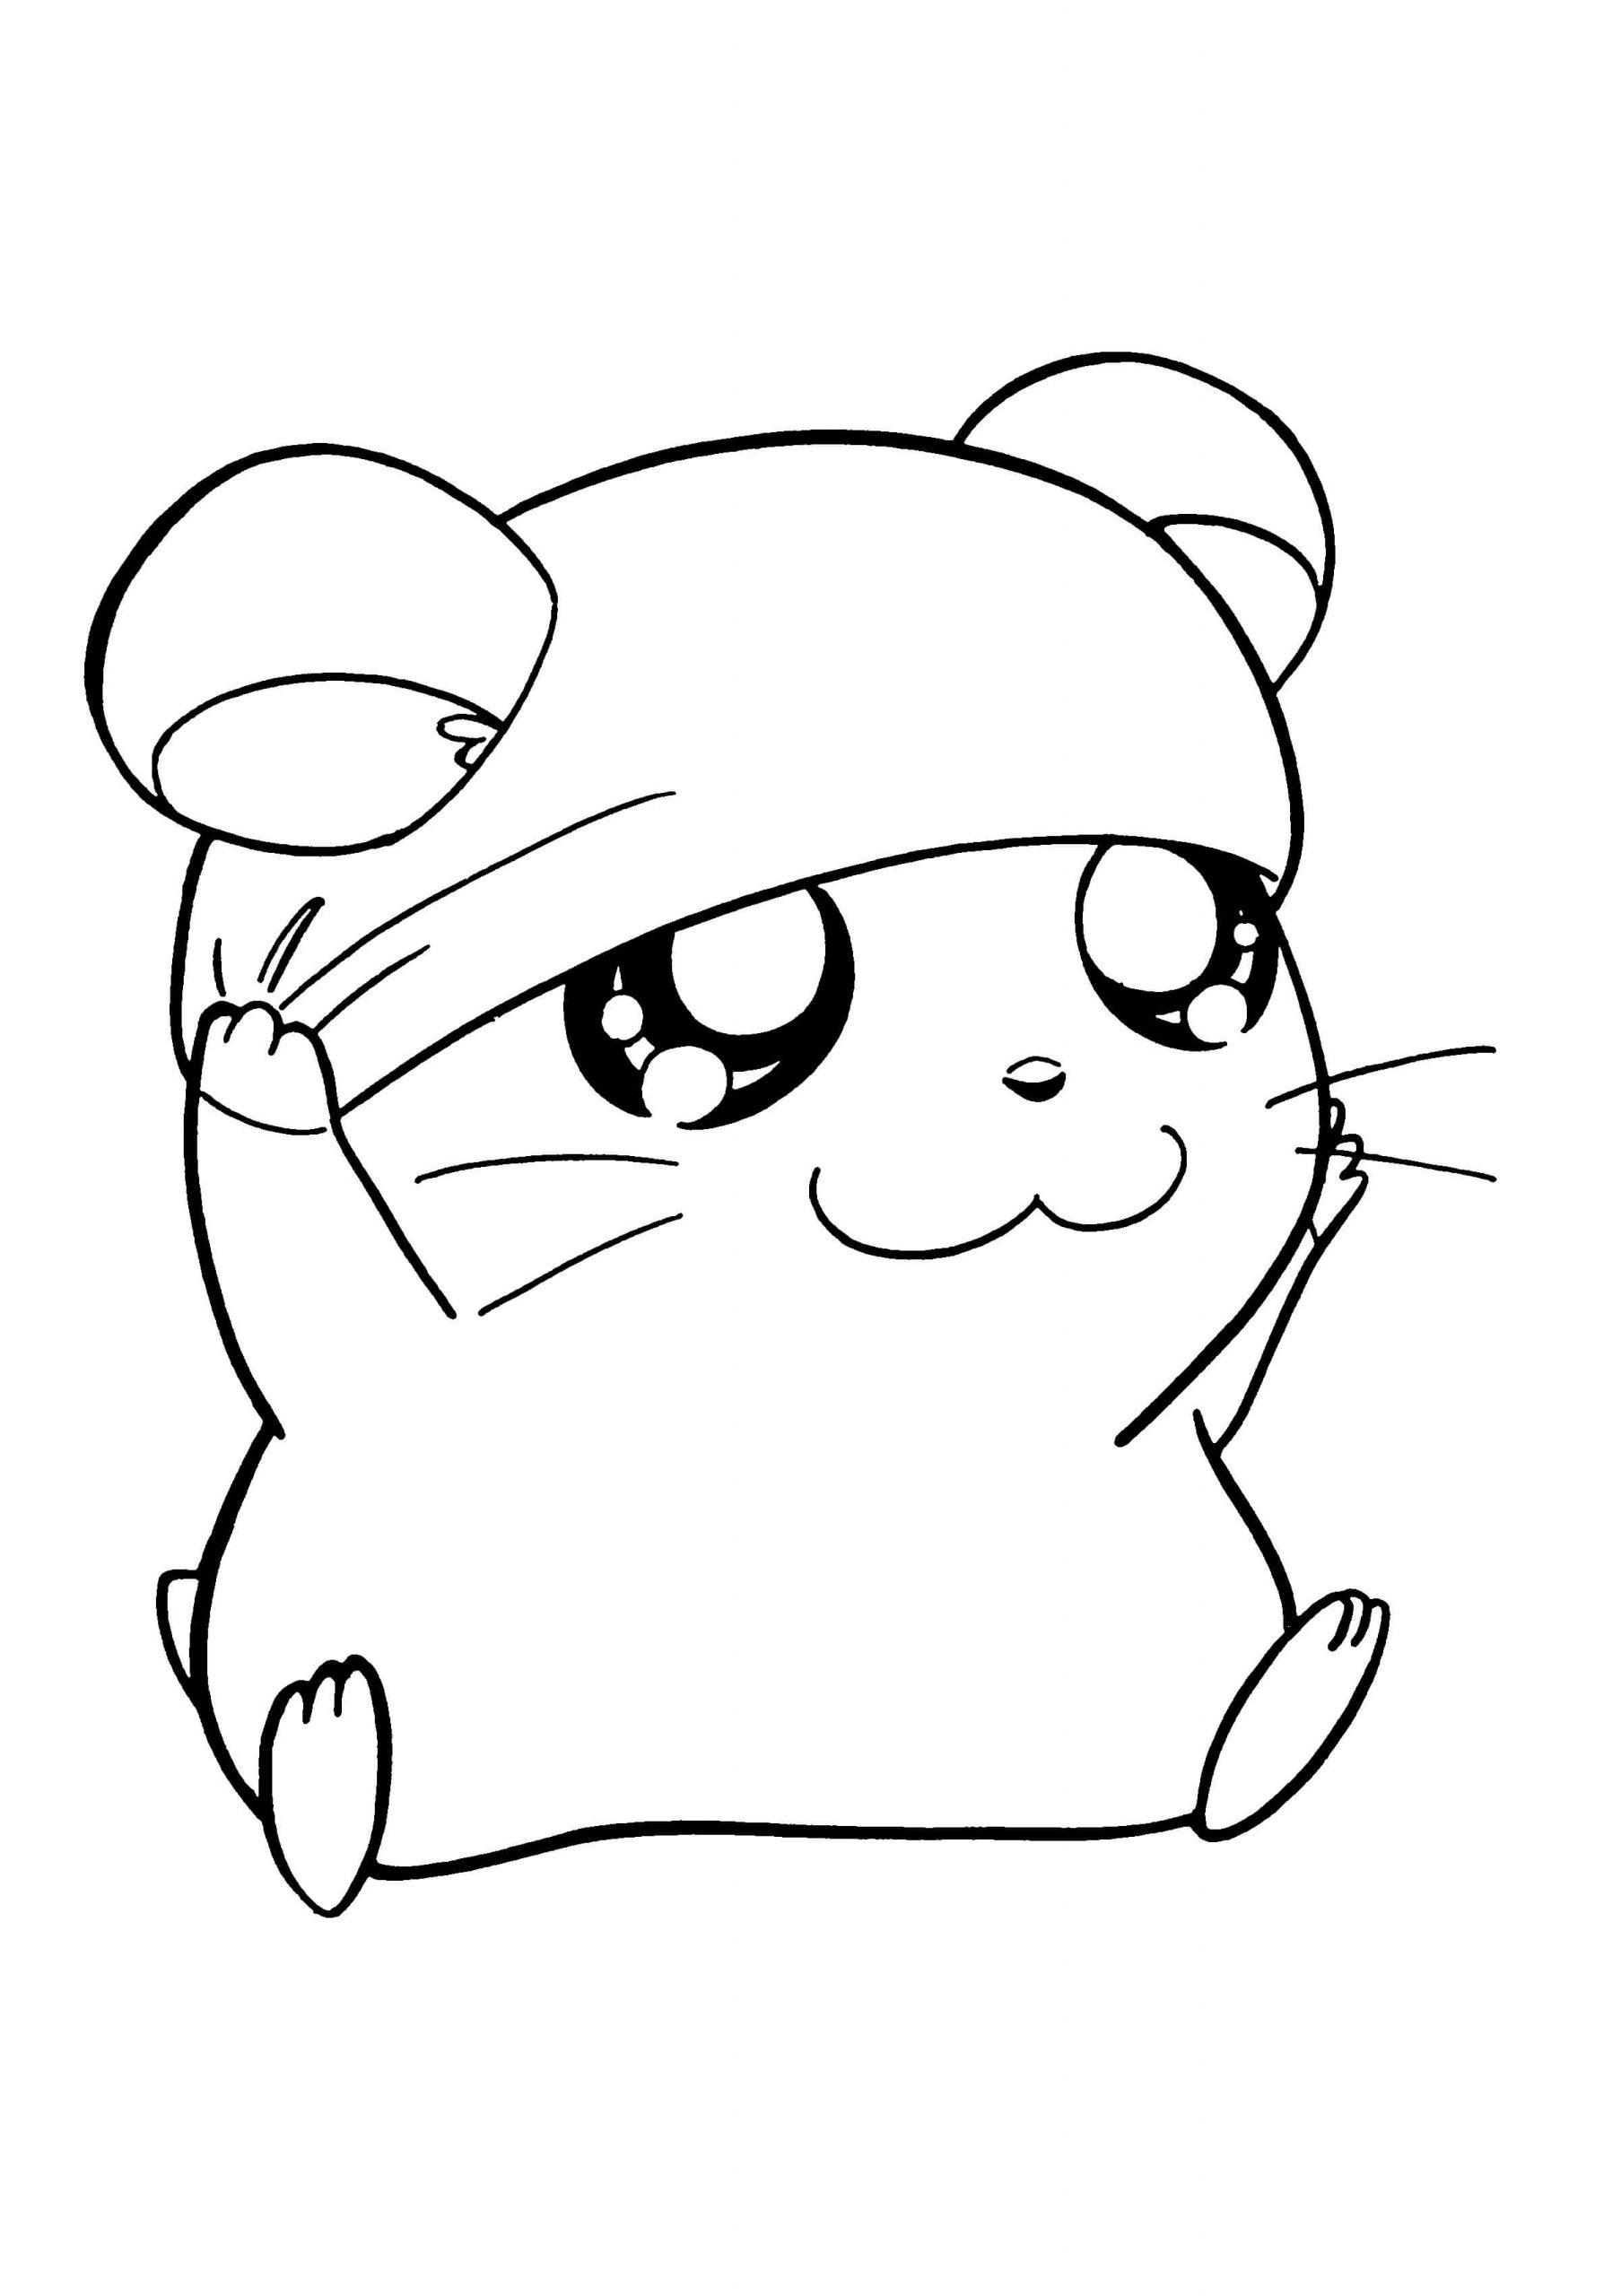 Desenhos de Hamster Fofo Sorrindo para colorir